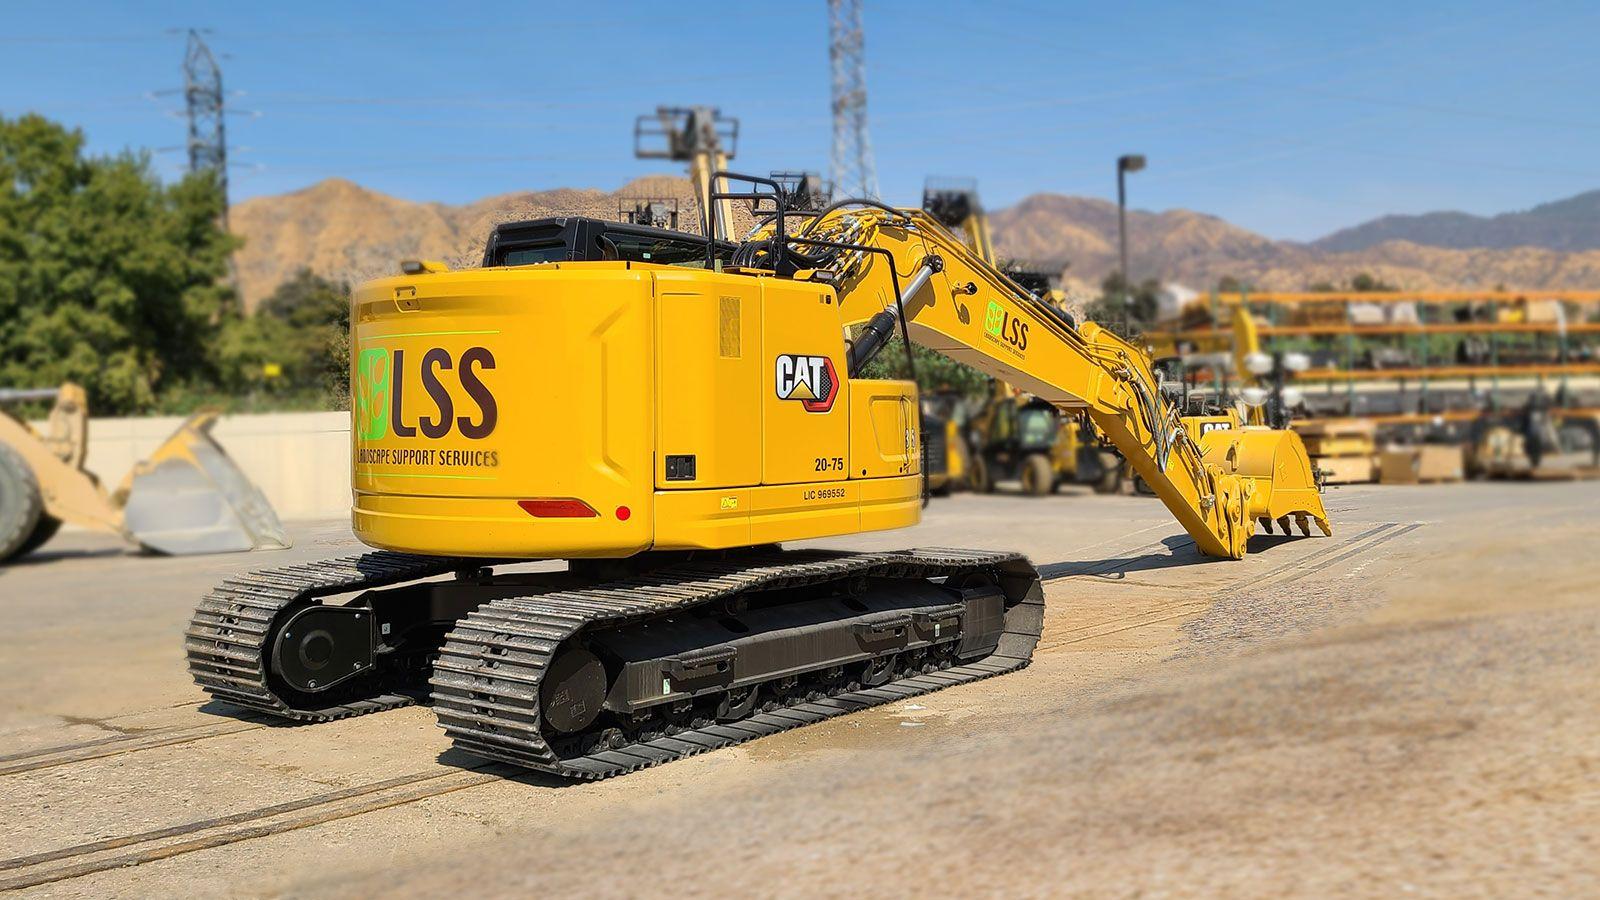 LSS custom truck decals